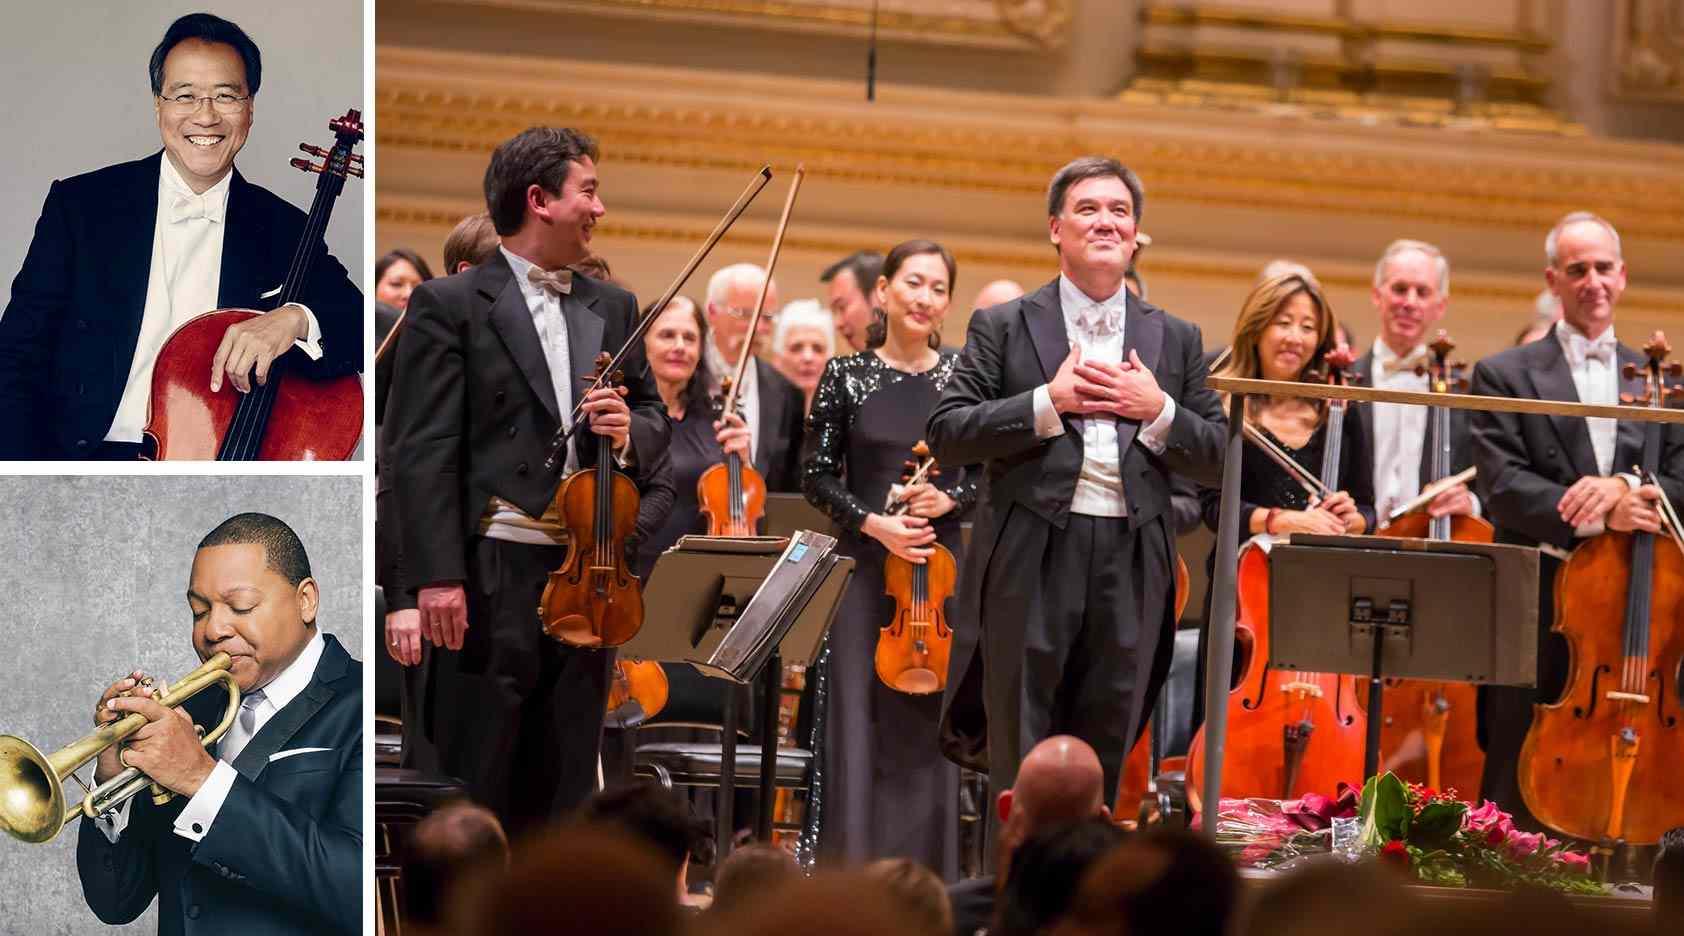 gilbert conducts wagner s das rheingold concert